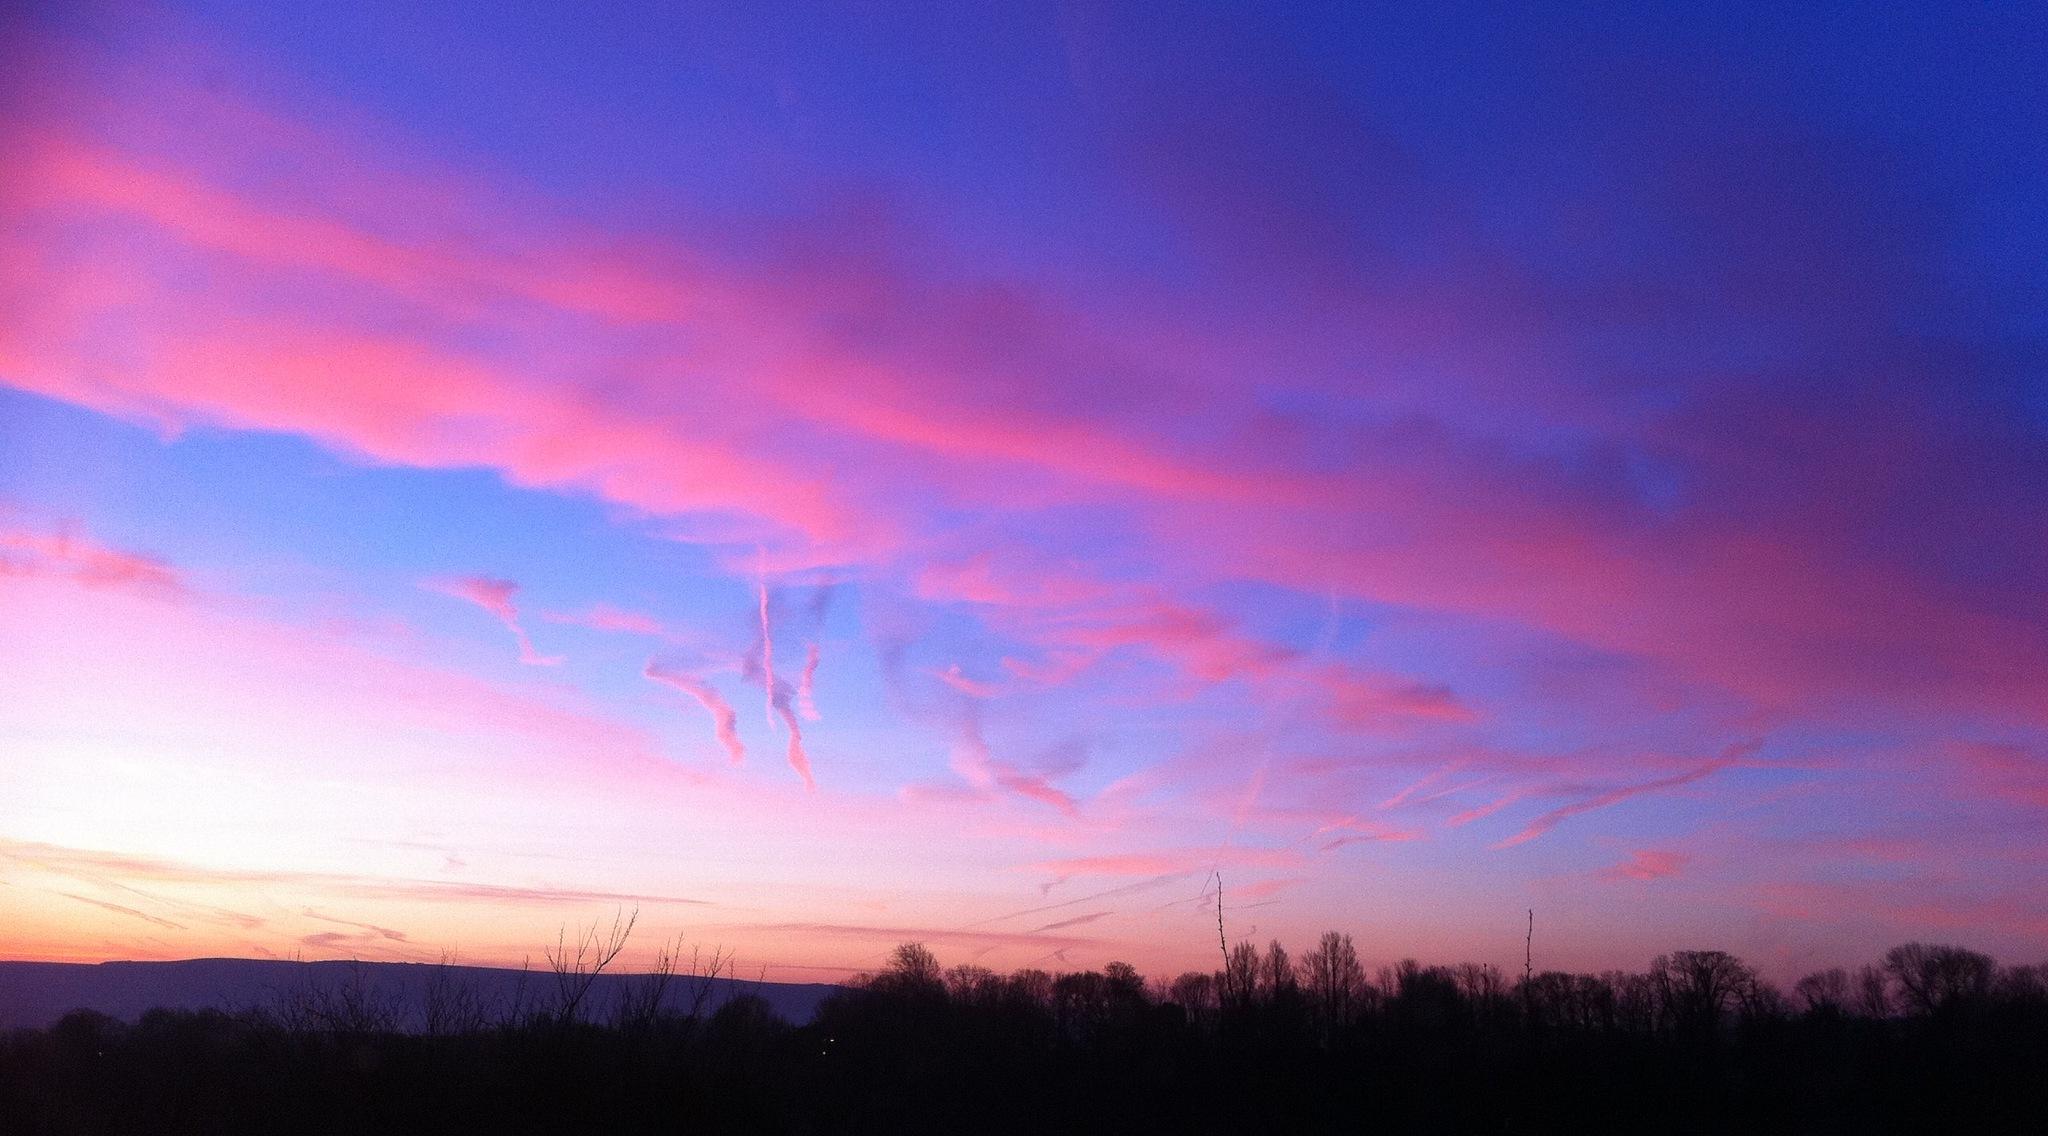 Sunrise from my window by Steven James Homewood